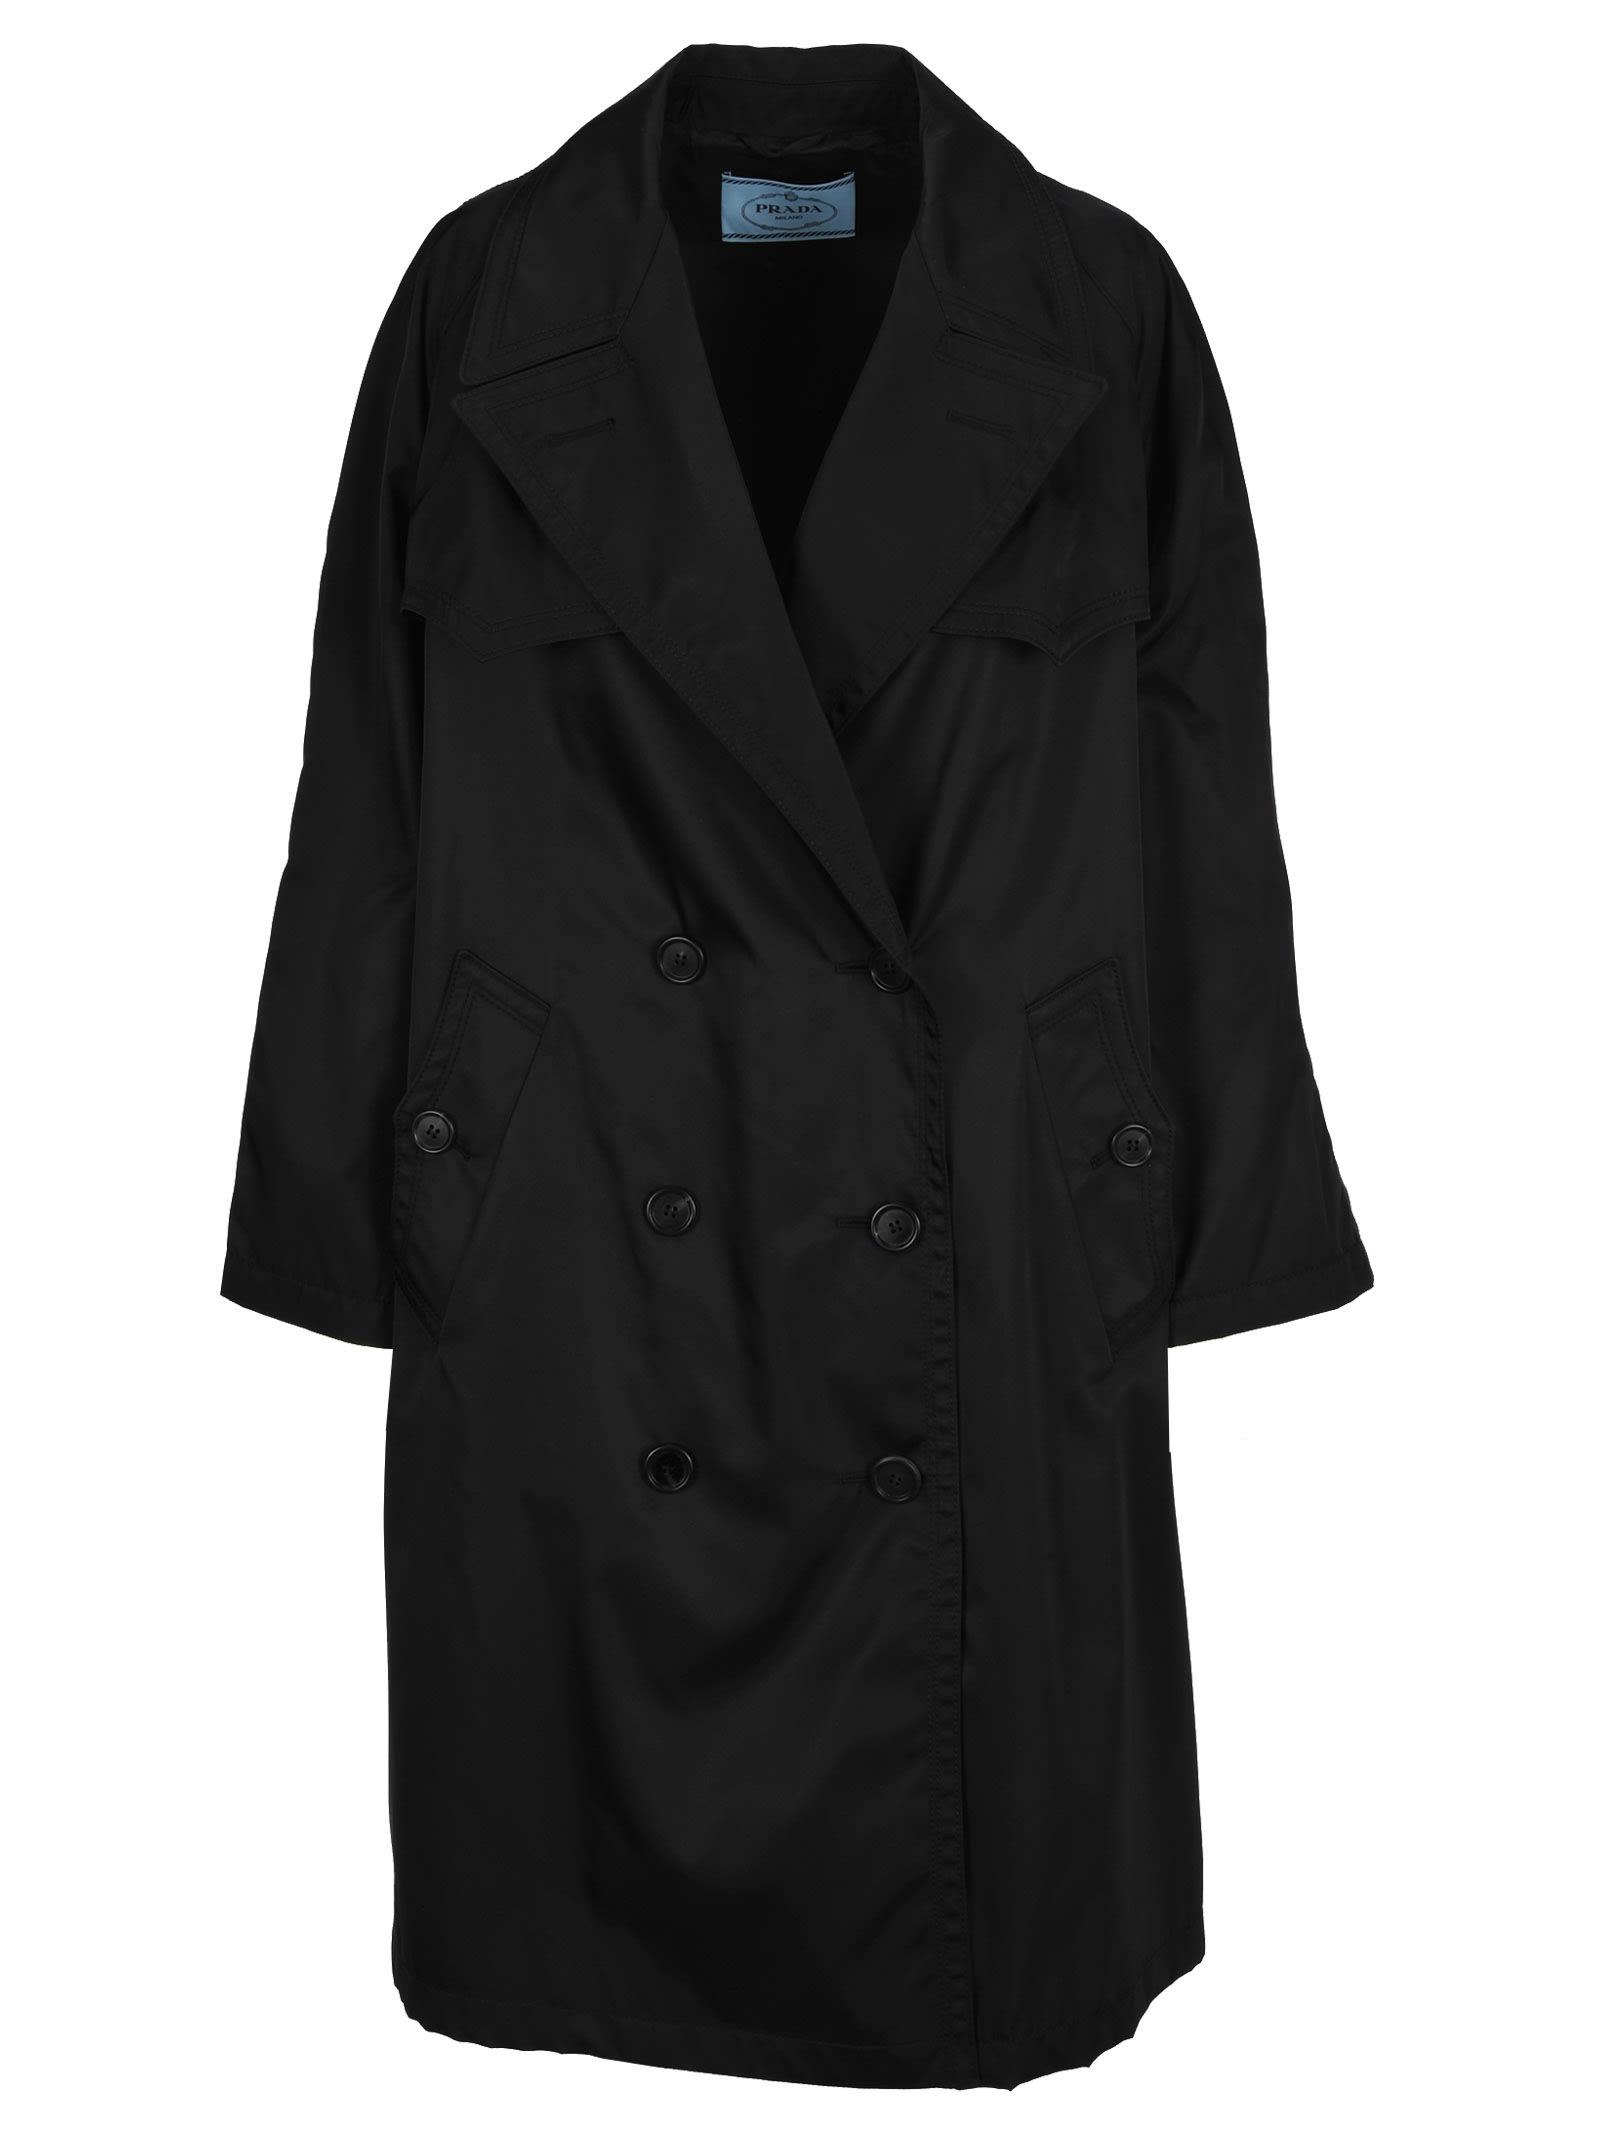 Photo of  Prada Prada Double-breasted Trench- shop Prada jackets online sales